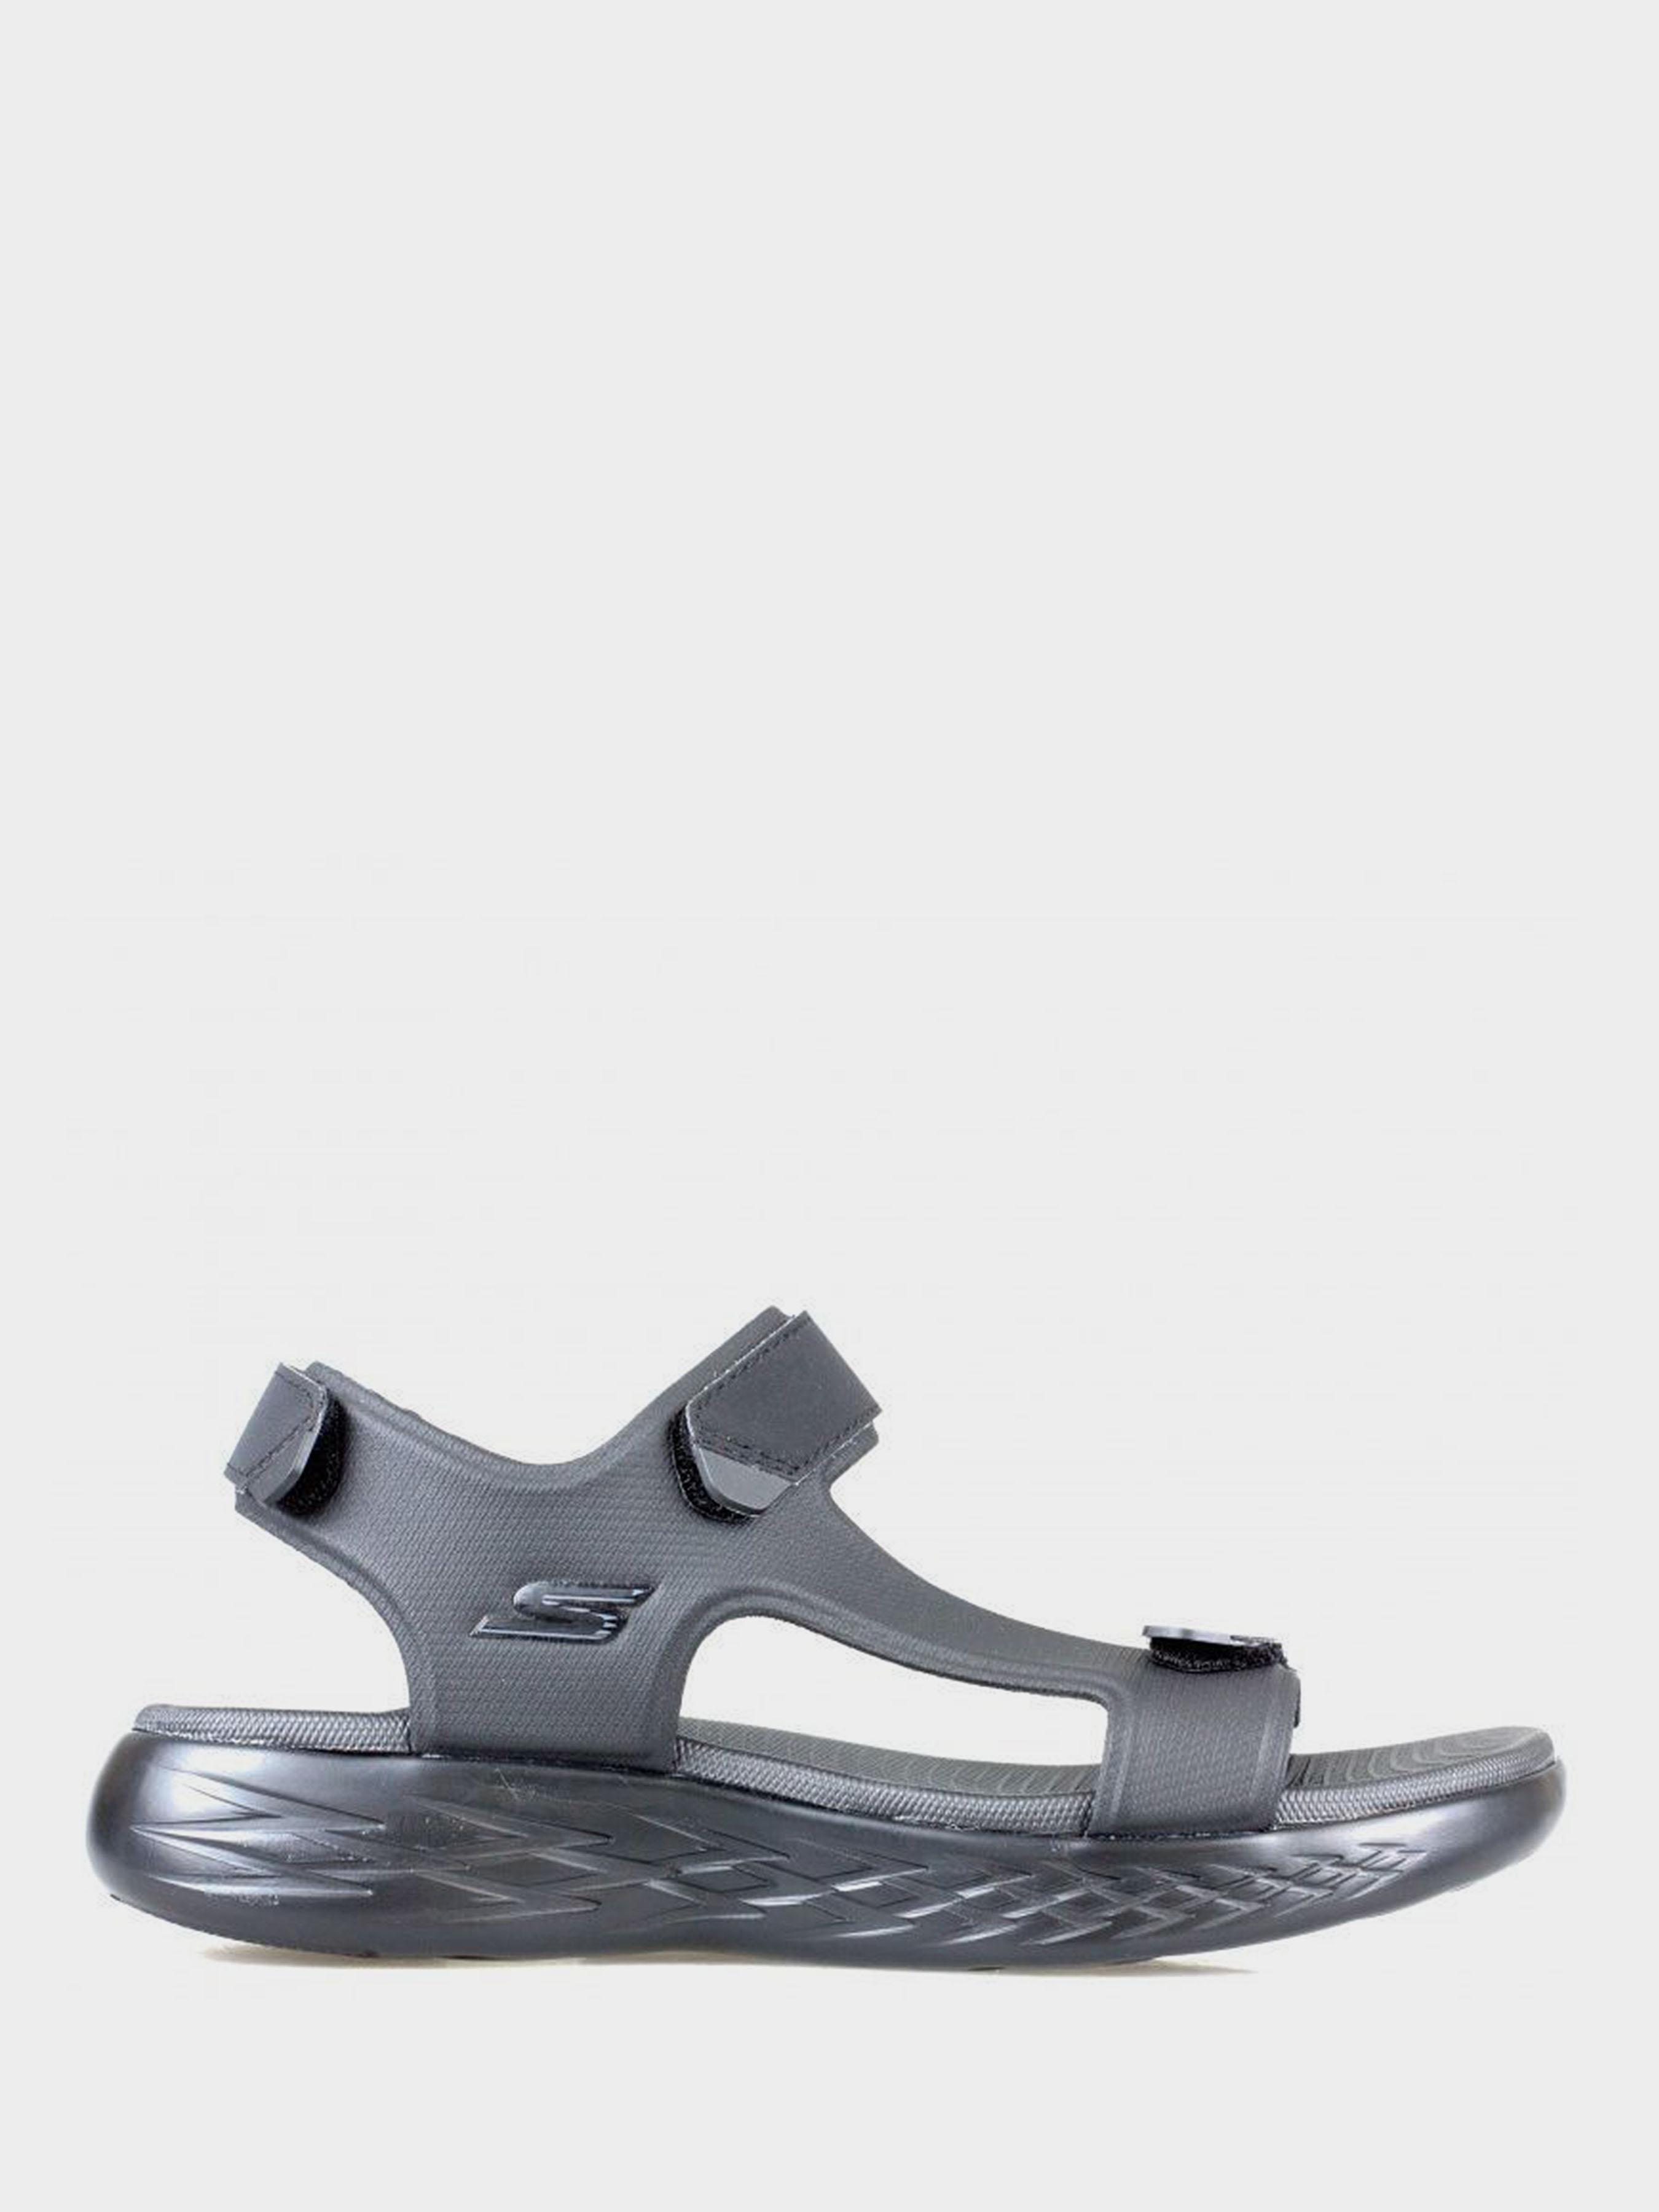 Сандалии мужские Skechers ON-THE-GO KM2825 продажа, 2017